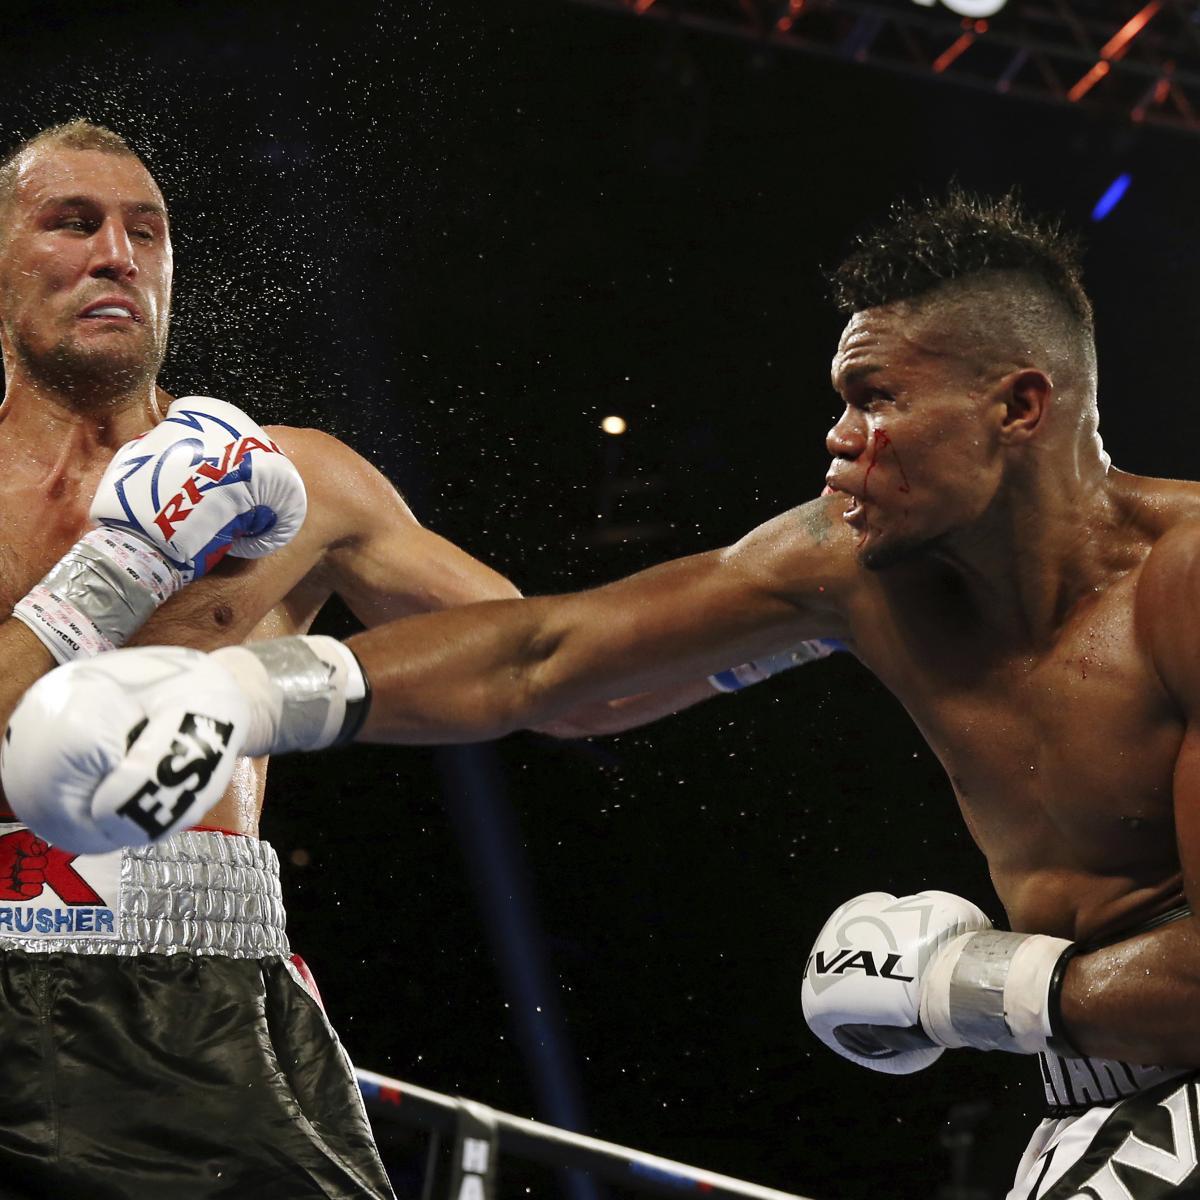 Eleider Alvarez Vs. Sergey Kovalev: Fight Odds, Time, Date